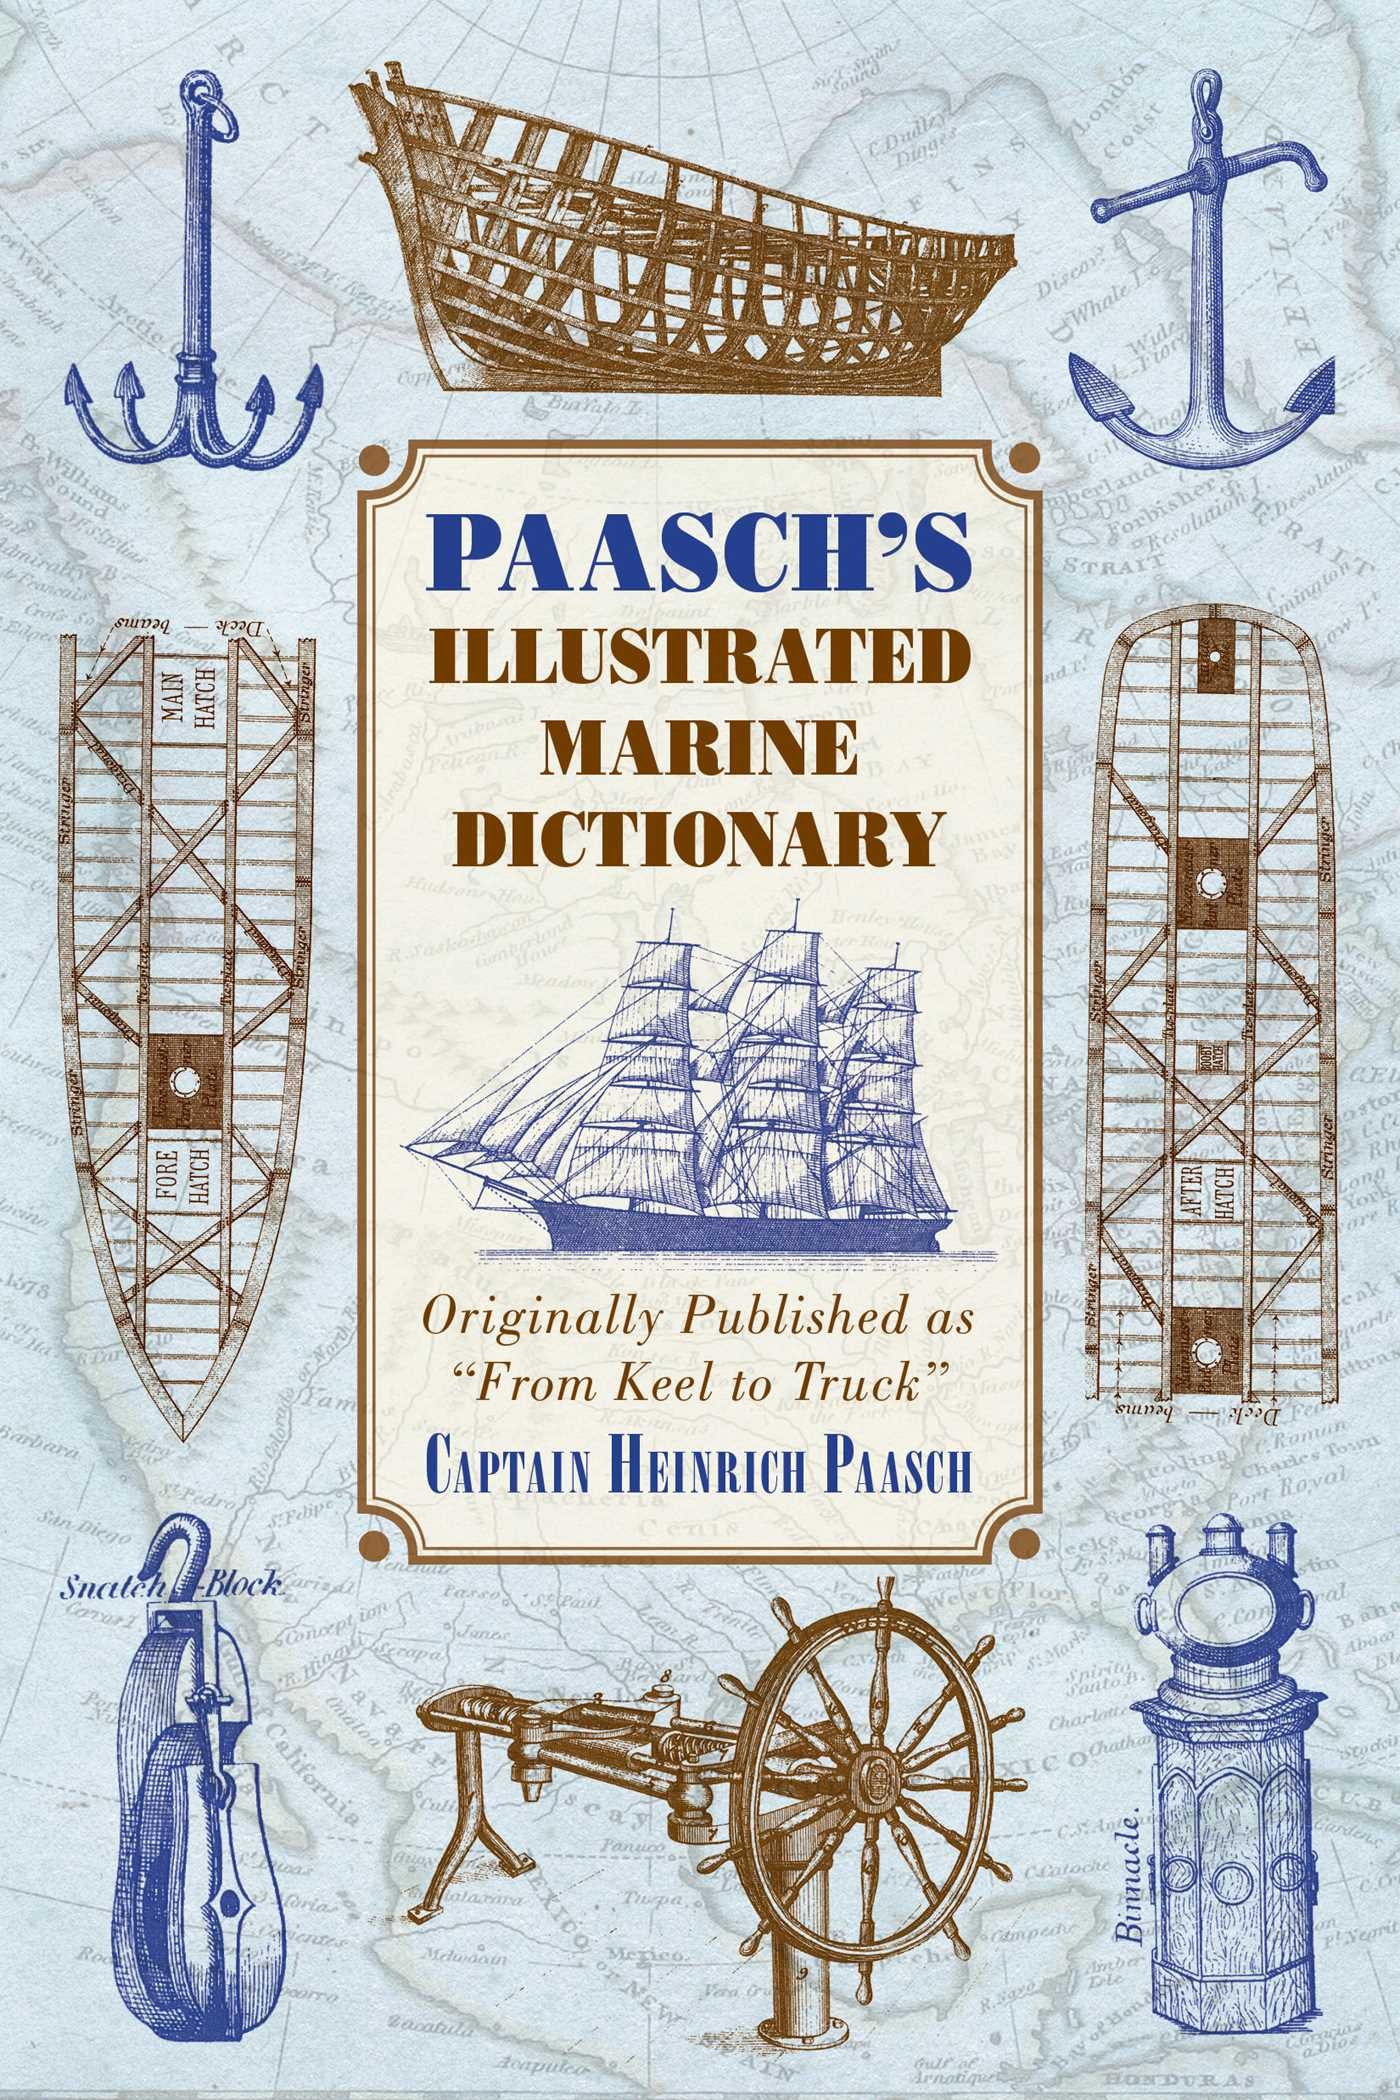 H. Paasch book